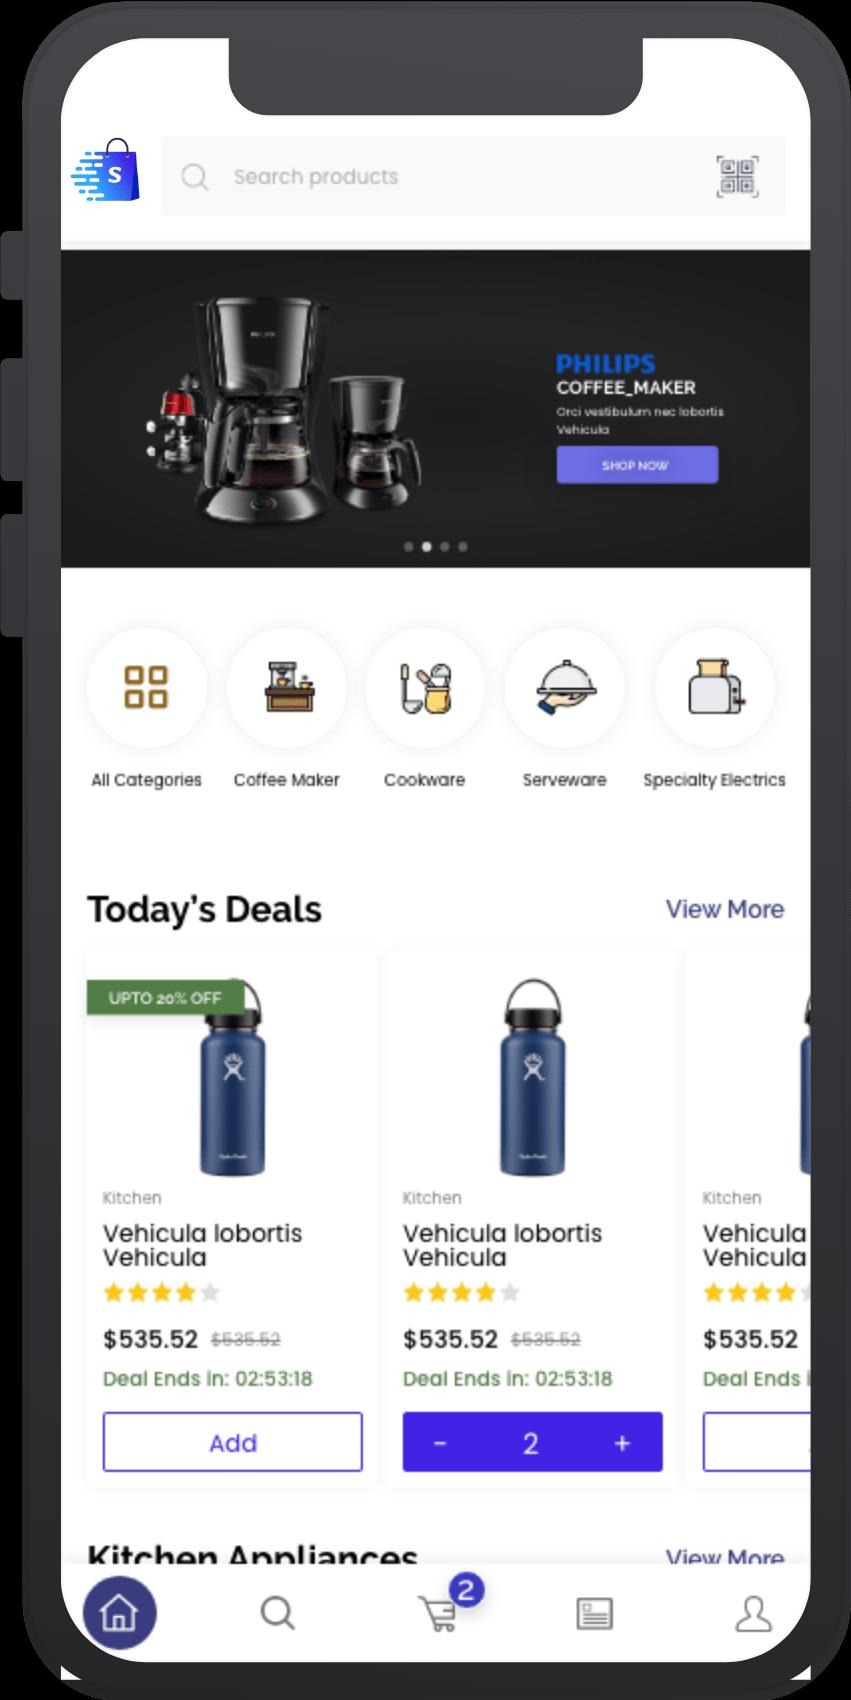 Multi-Vendor eCommerce Marketplace Platform Multi-Vendor eCommerce Marketplace Platform | With Customer, Store & Driver App